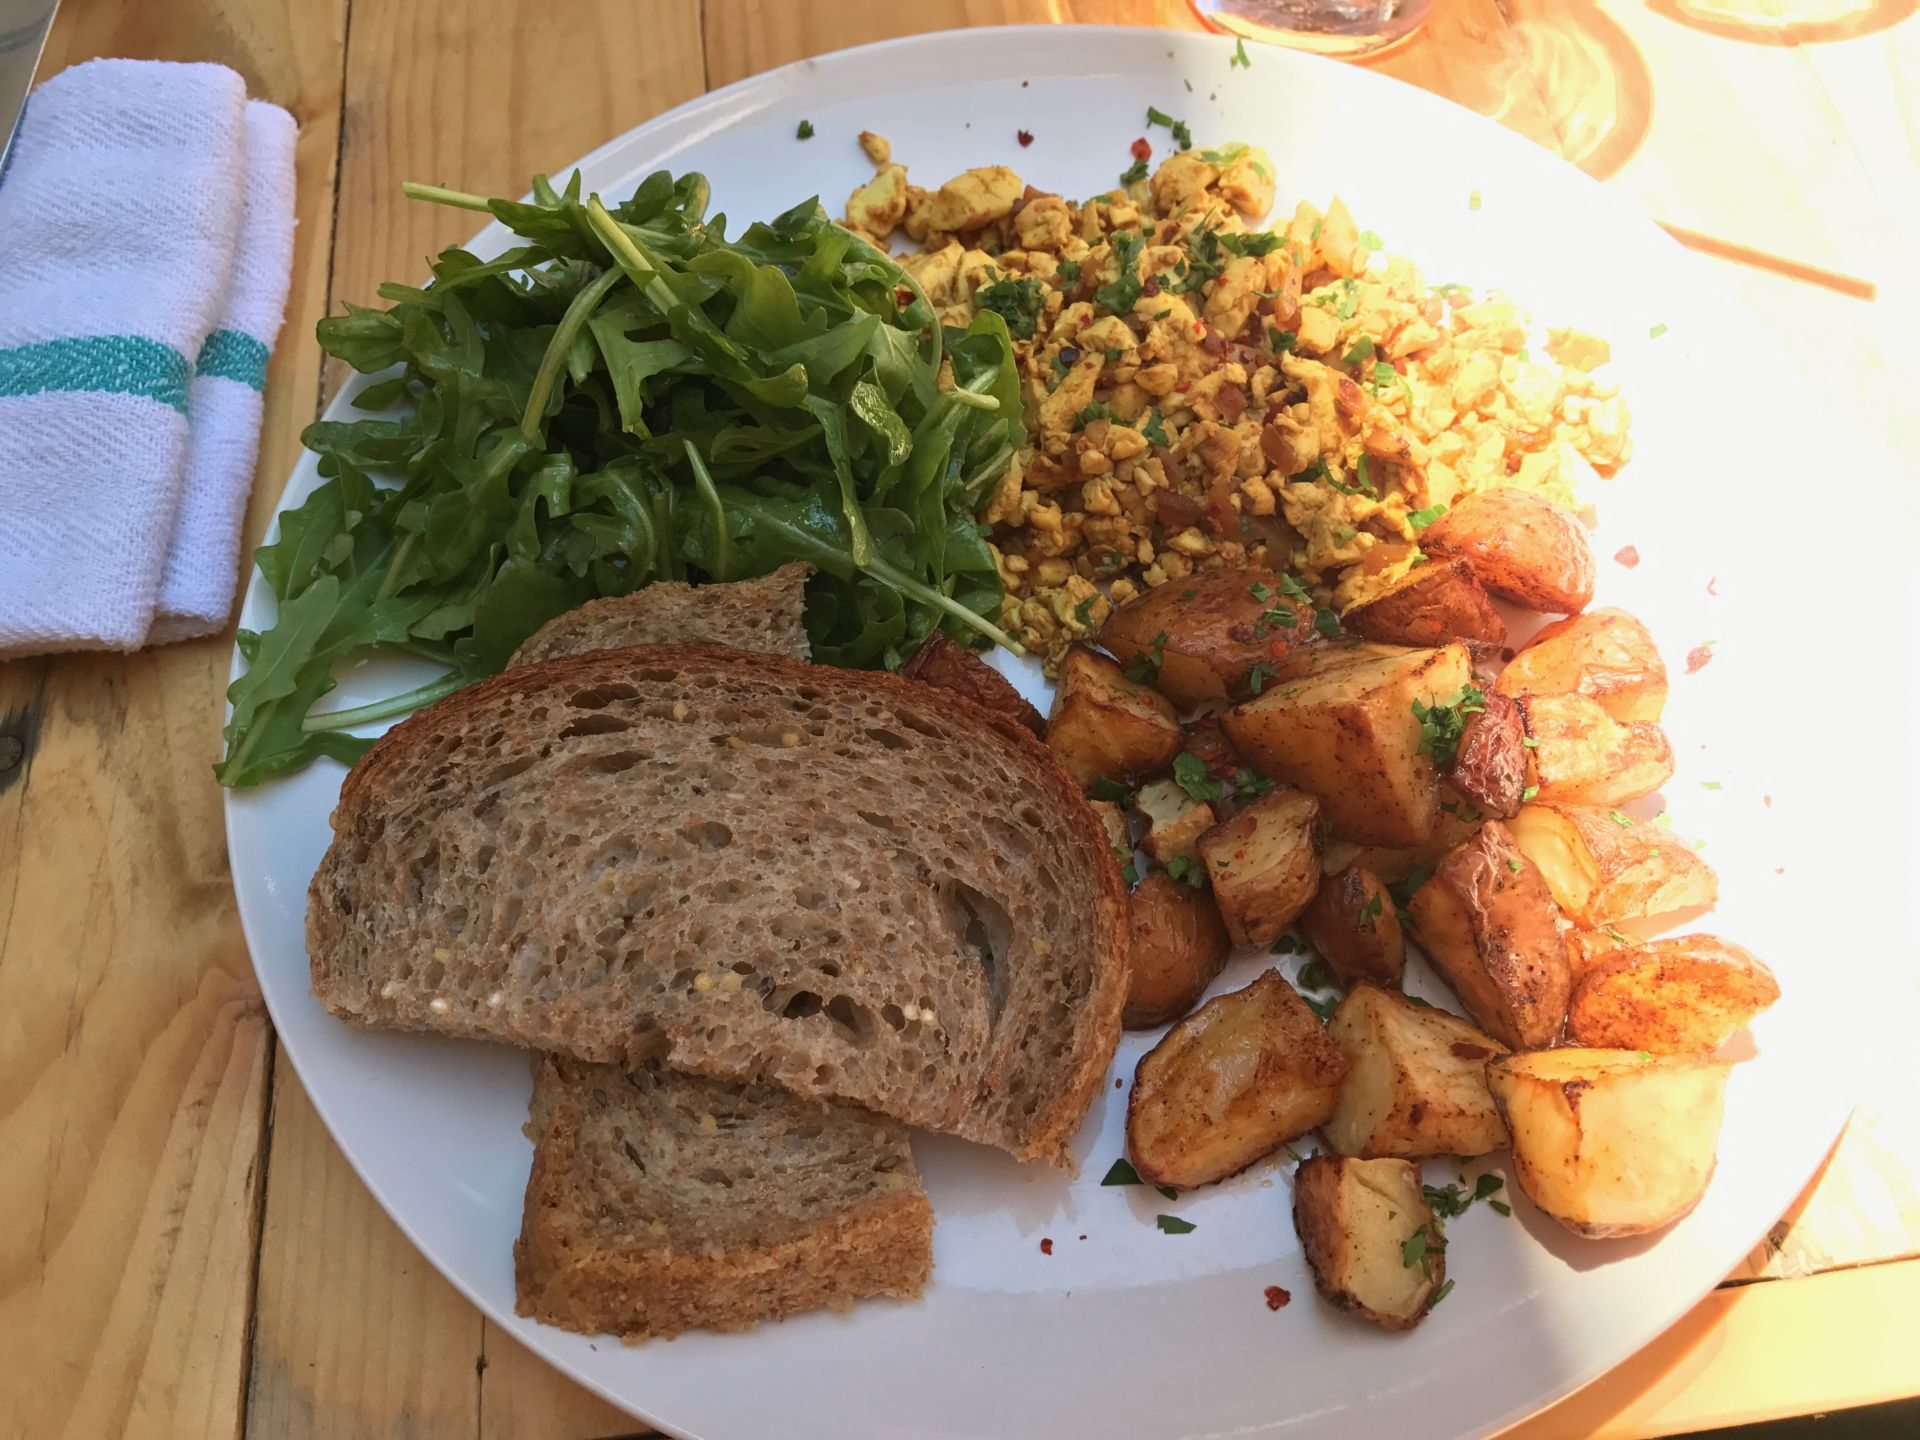 8 Vegan Breakfasts to Try in Jersey City